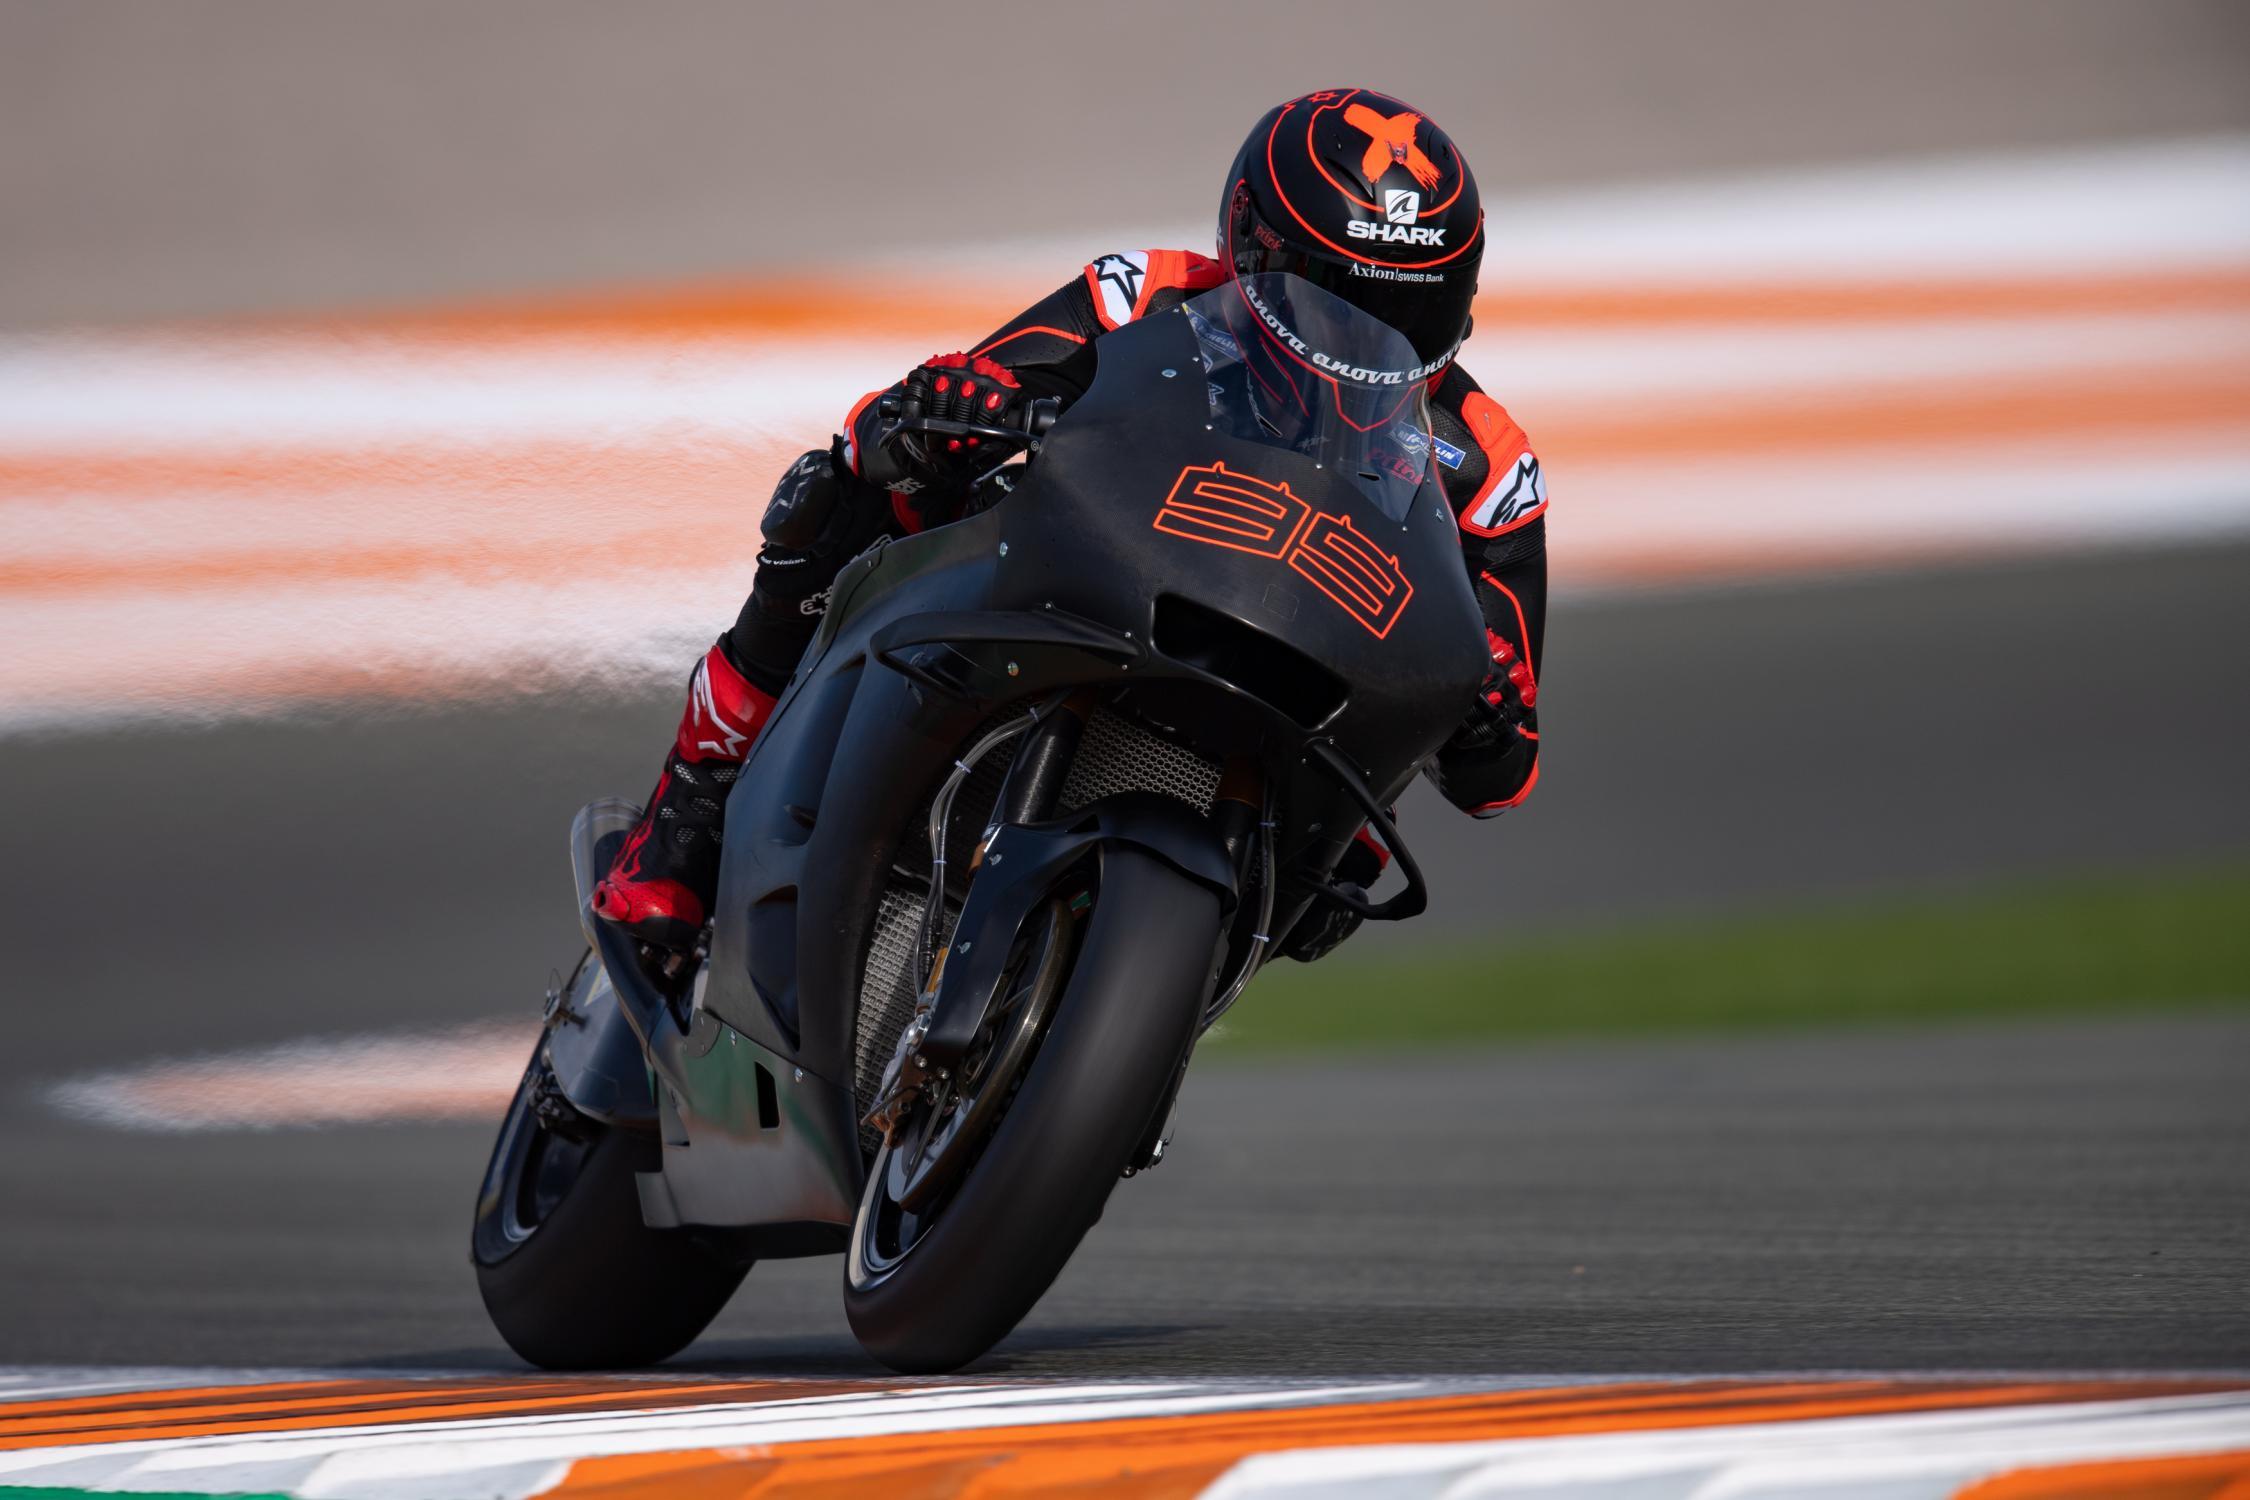 MOTO GP 2019 COMPÉTITIONS Jorge-lorenzo-valencia-test-j2-motogp-2018